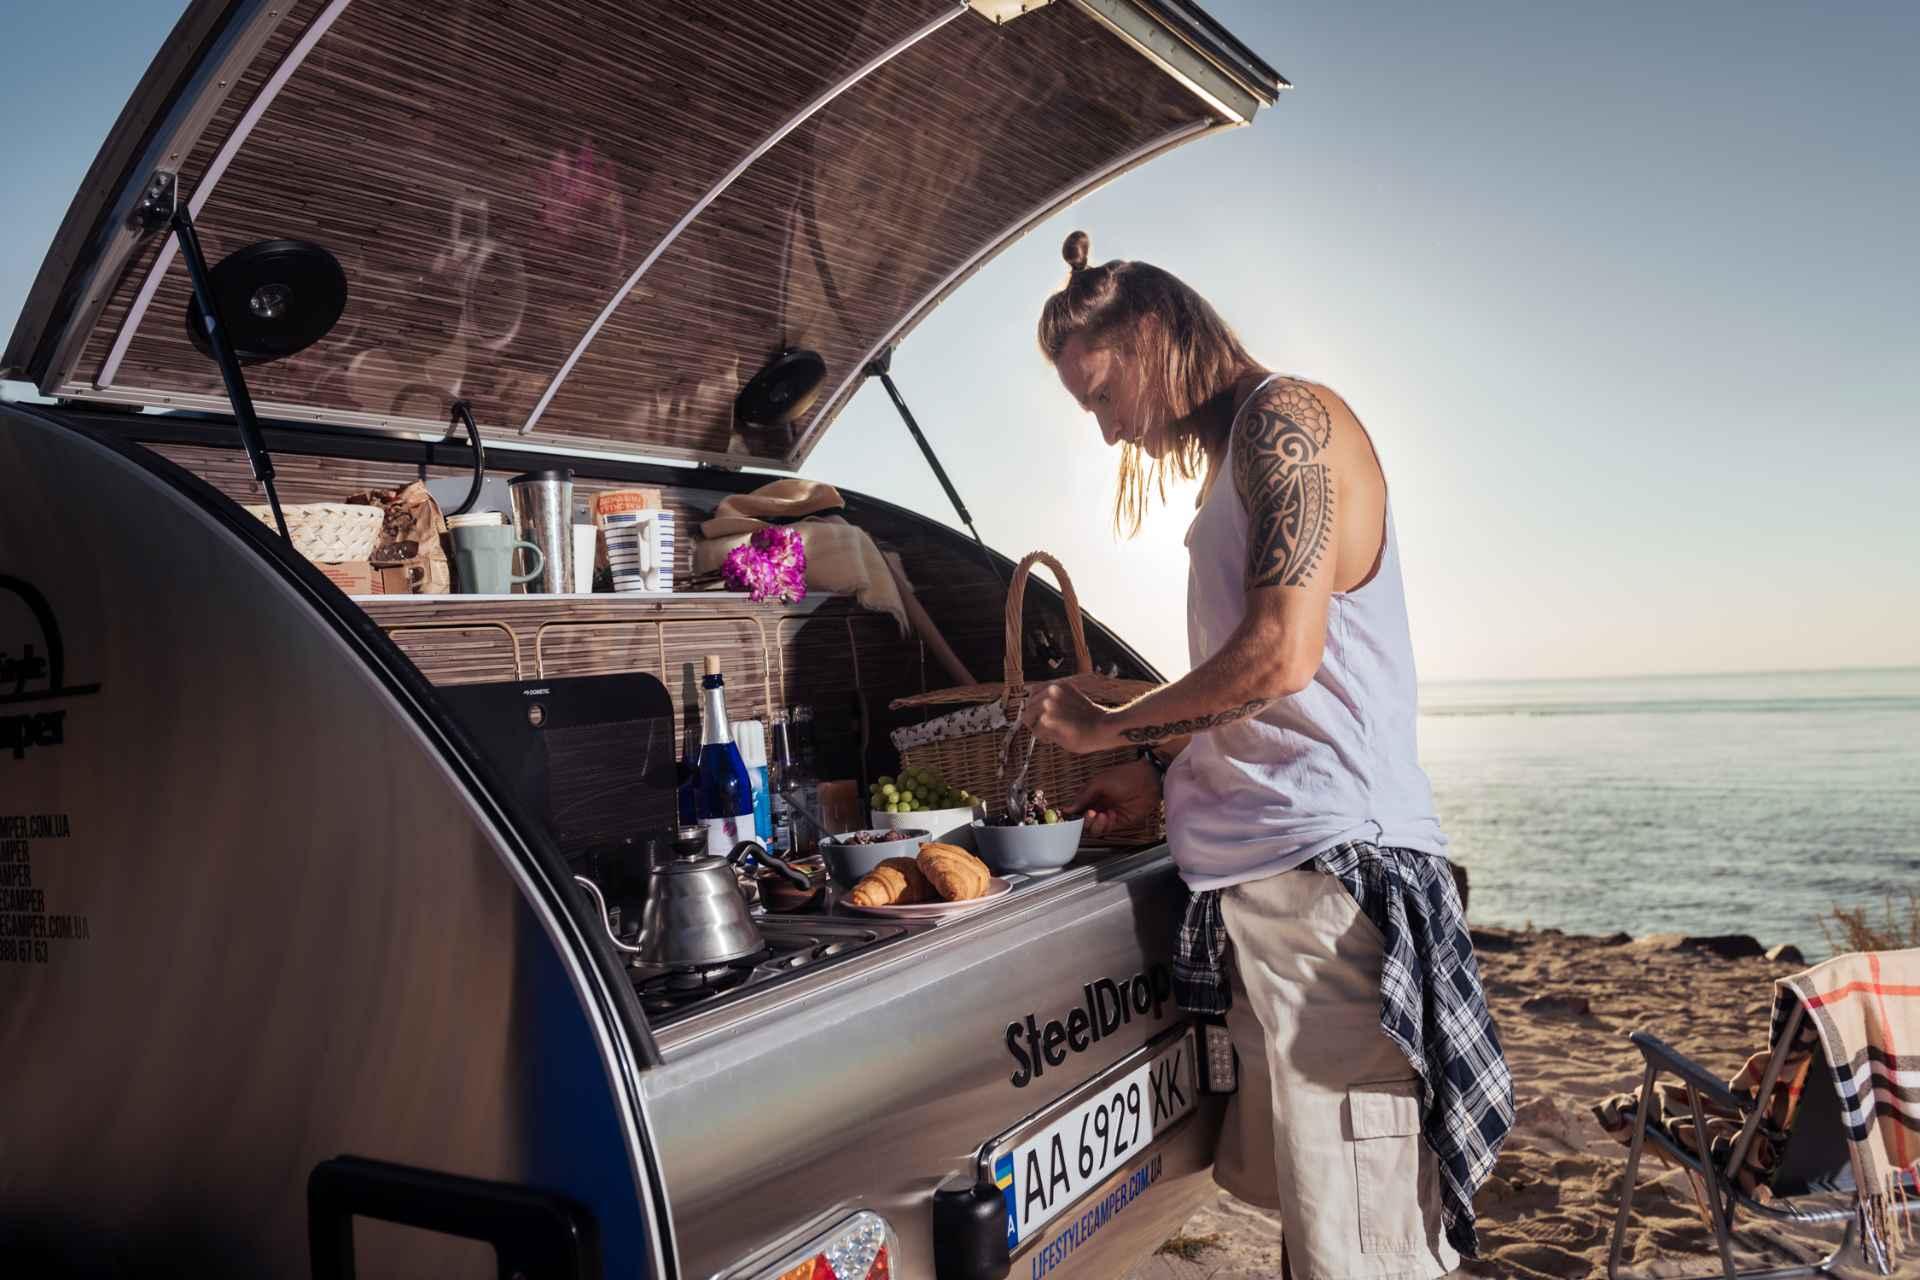 lifestyle camper norge steeldrop teardrop campingvogn produktfoto 7